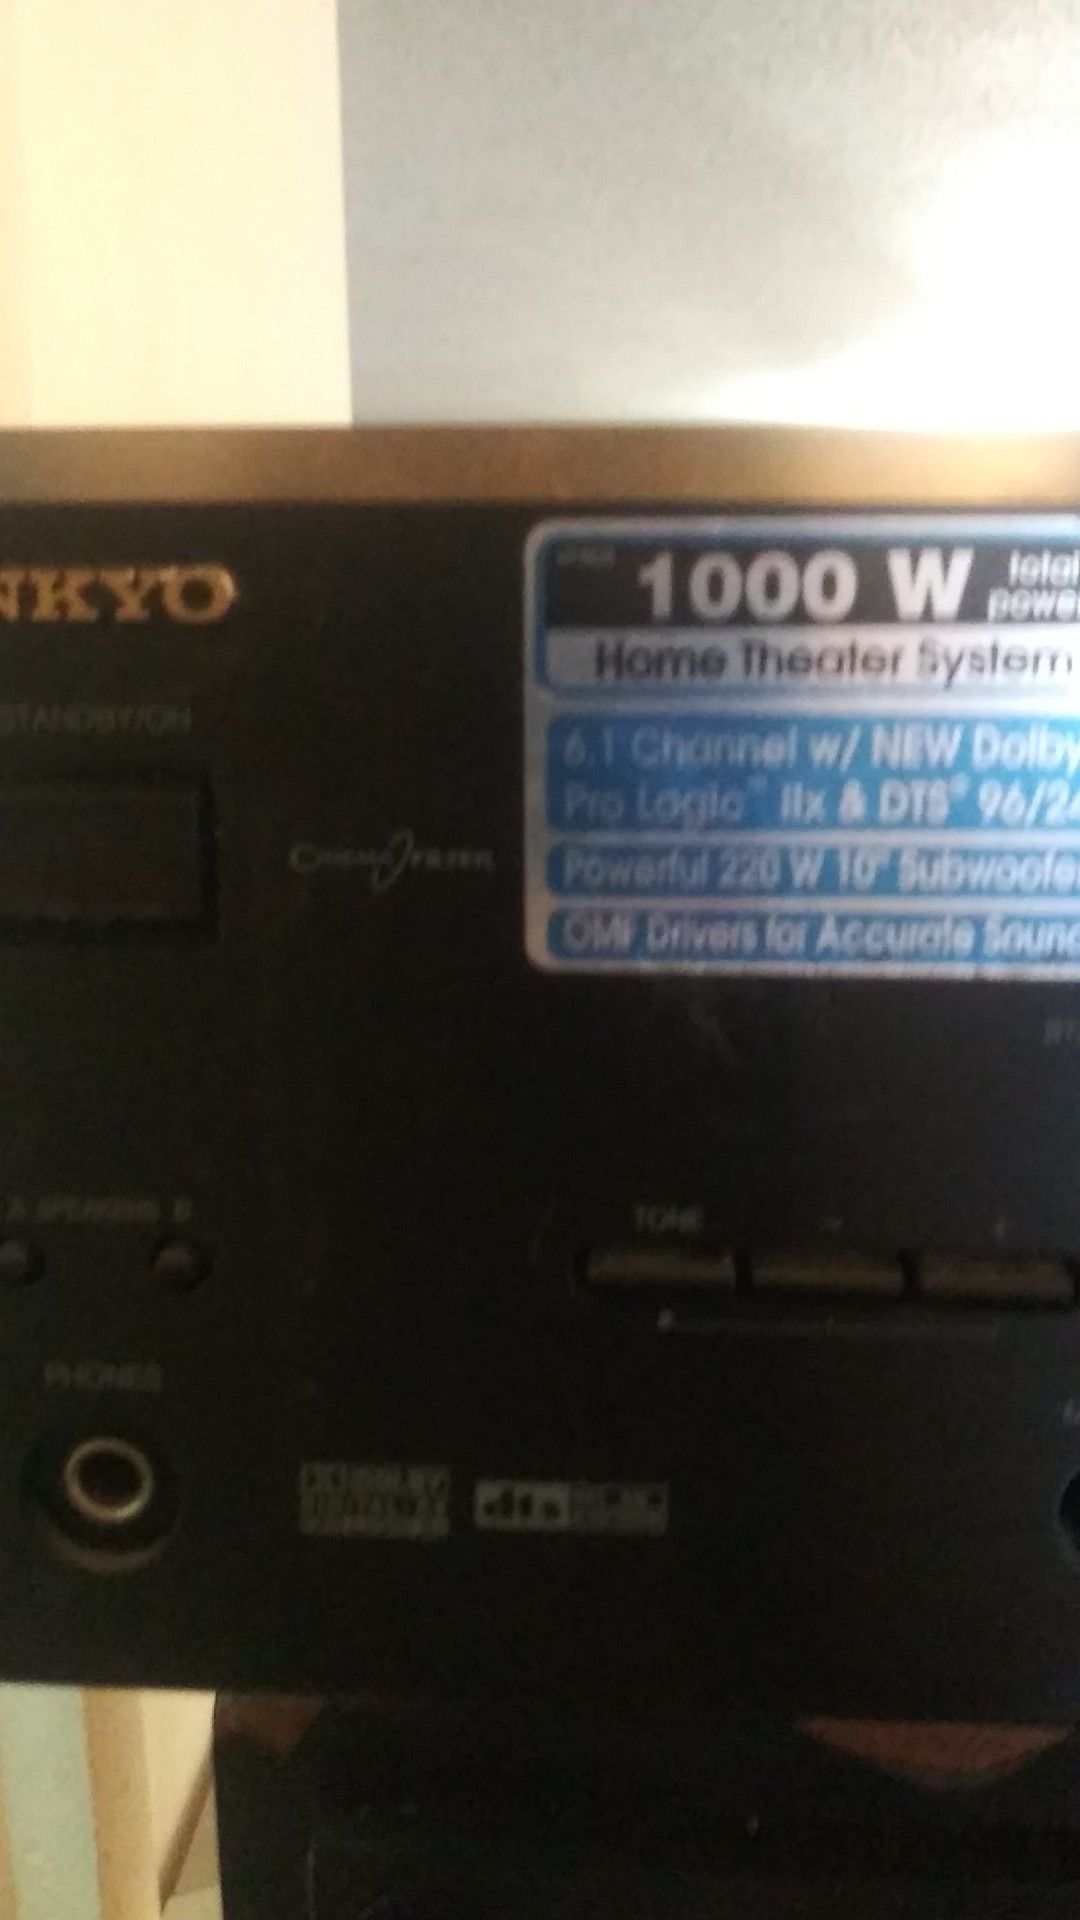 Onkyo 1000 w receiver